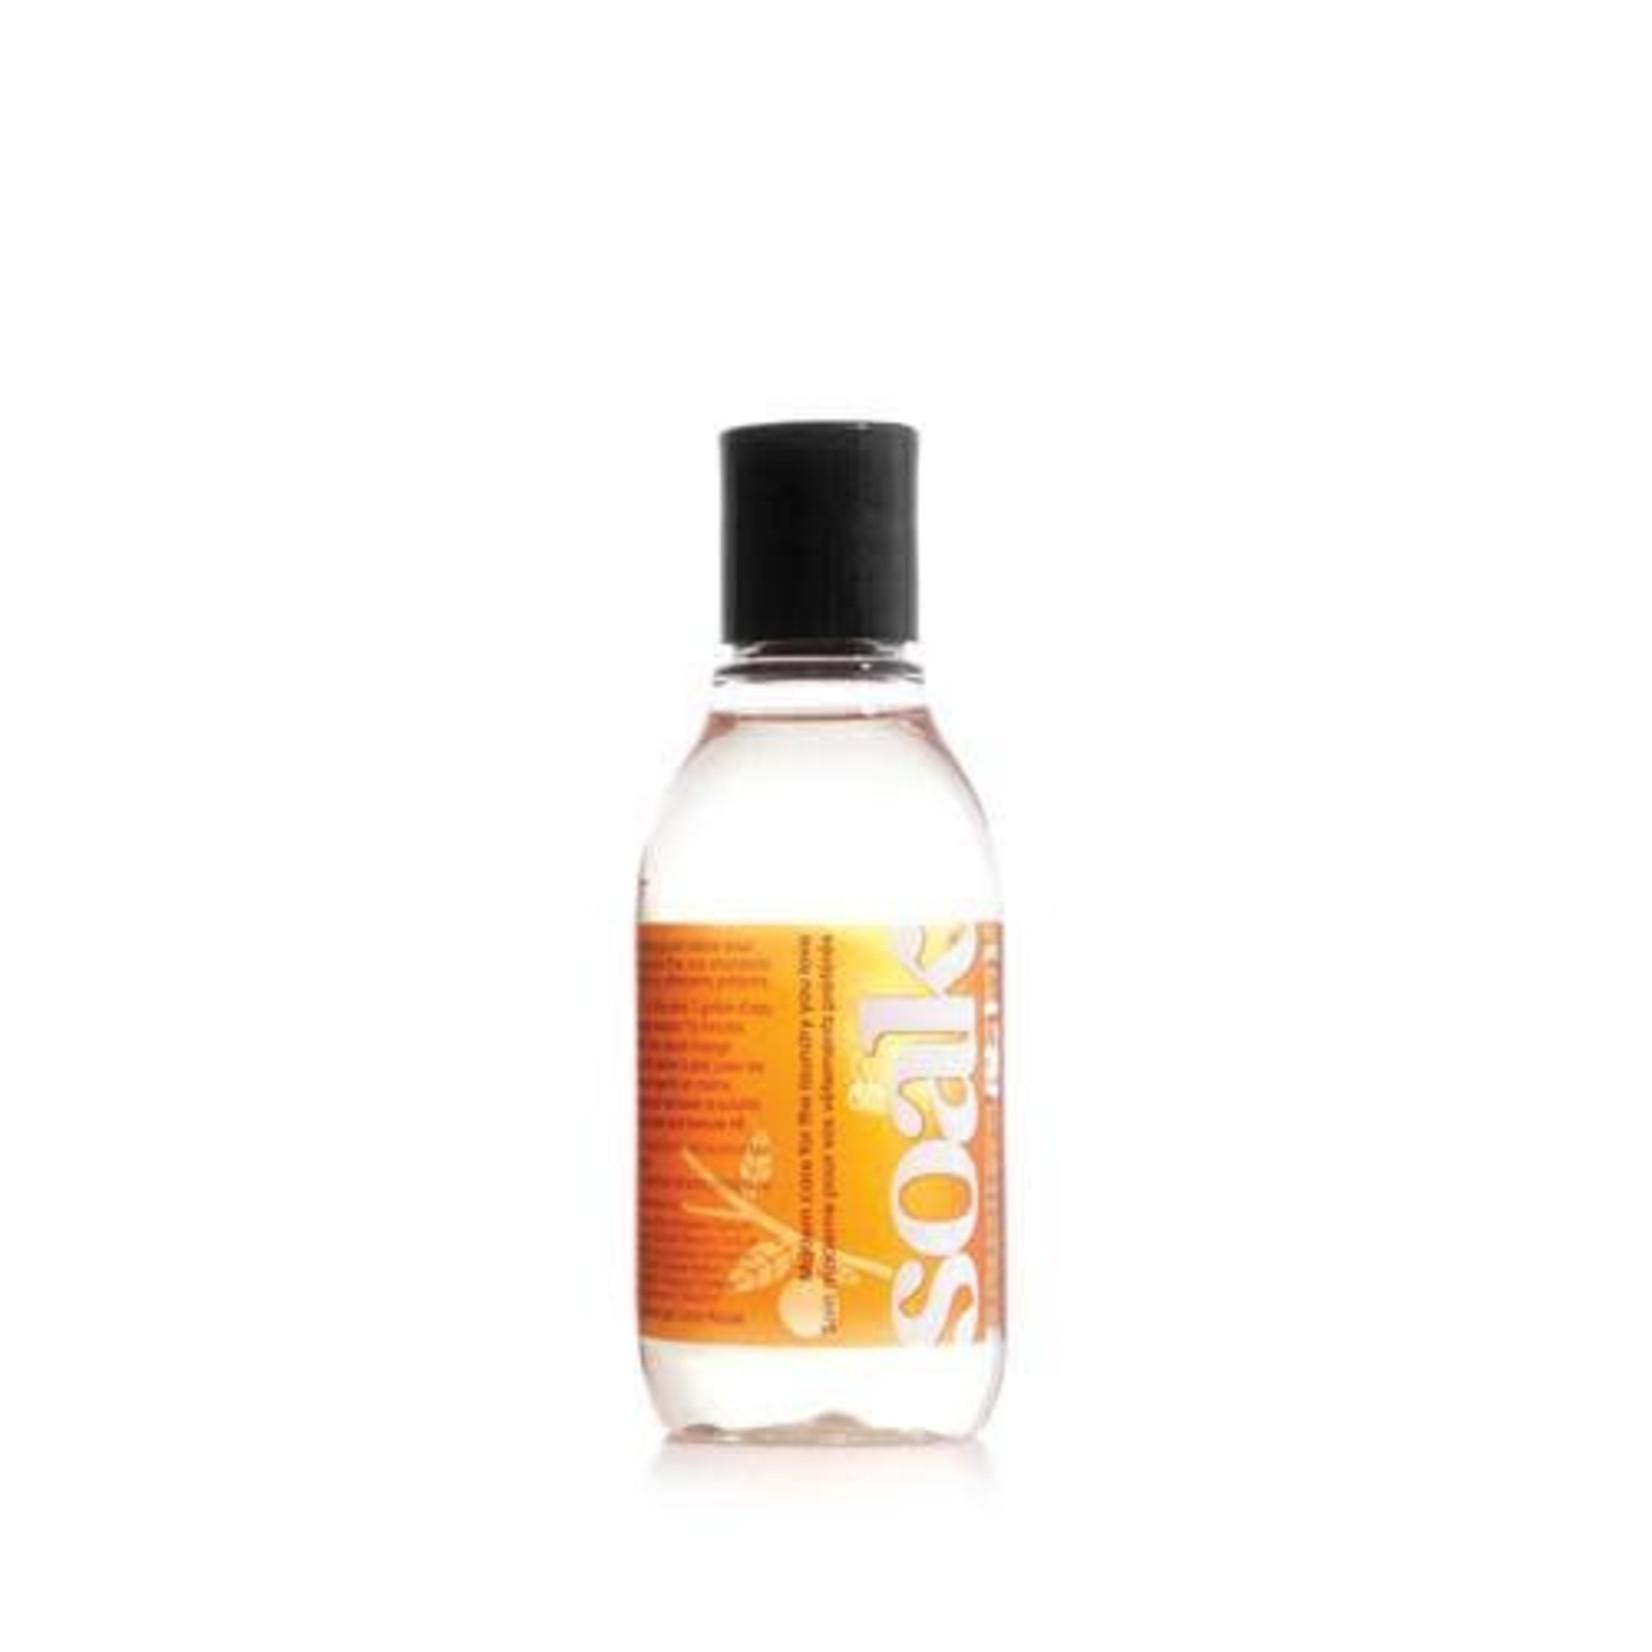 Soak Soak Wash - Small